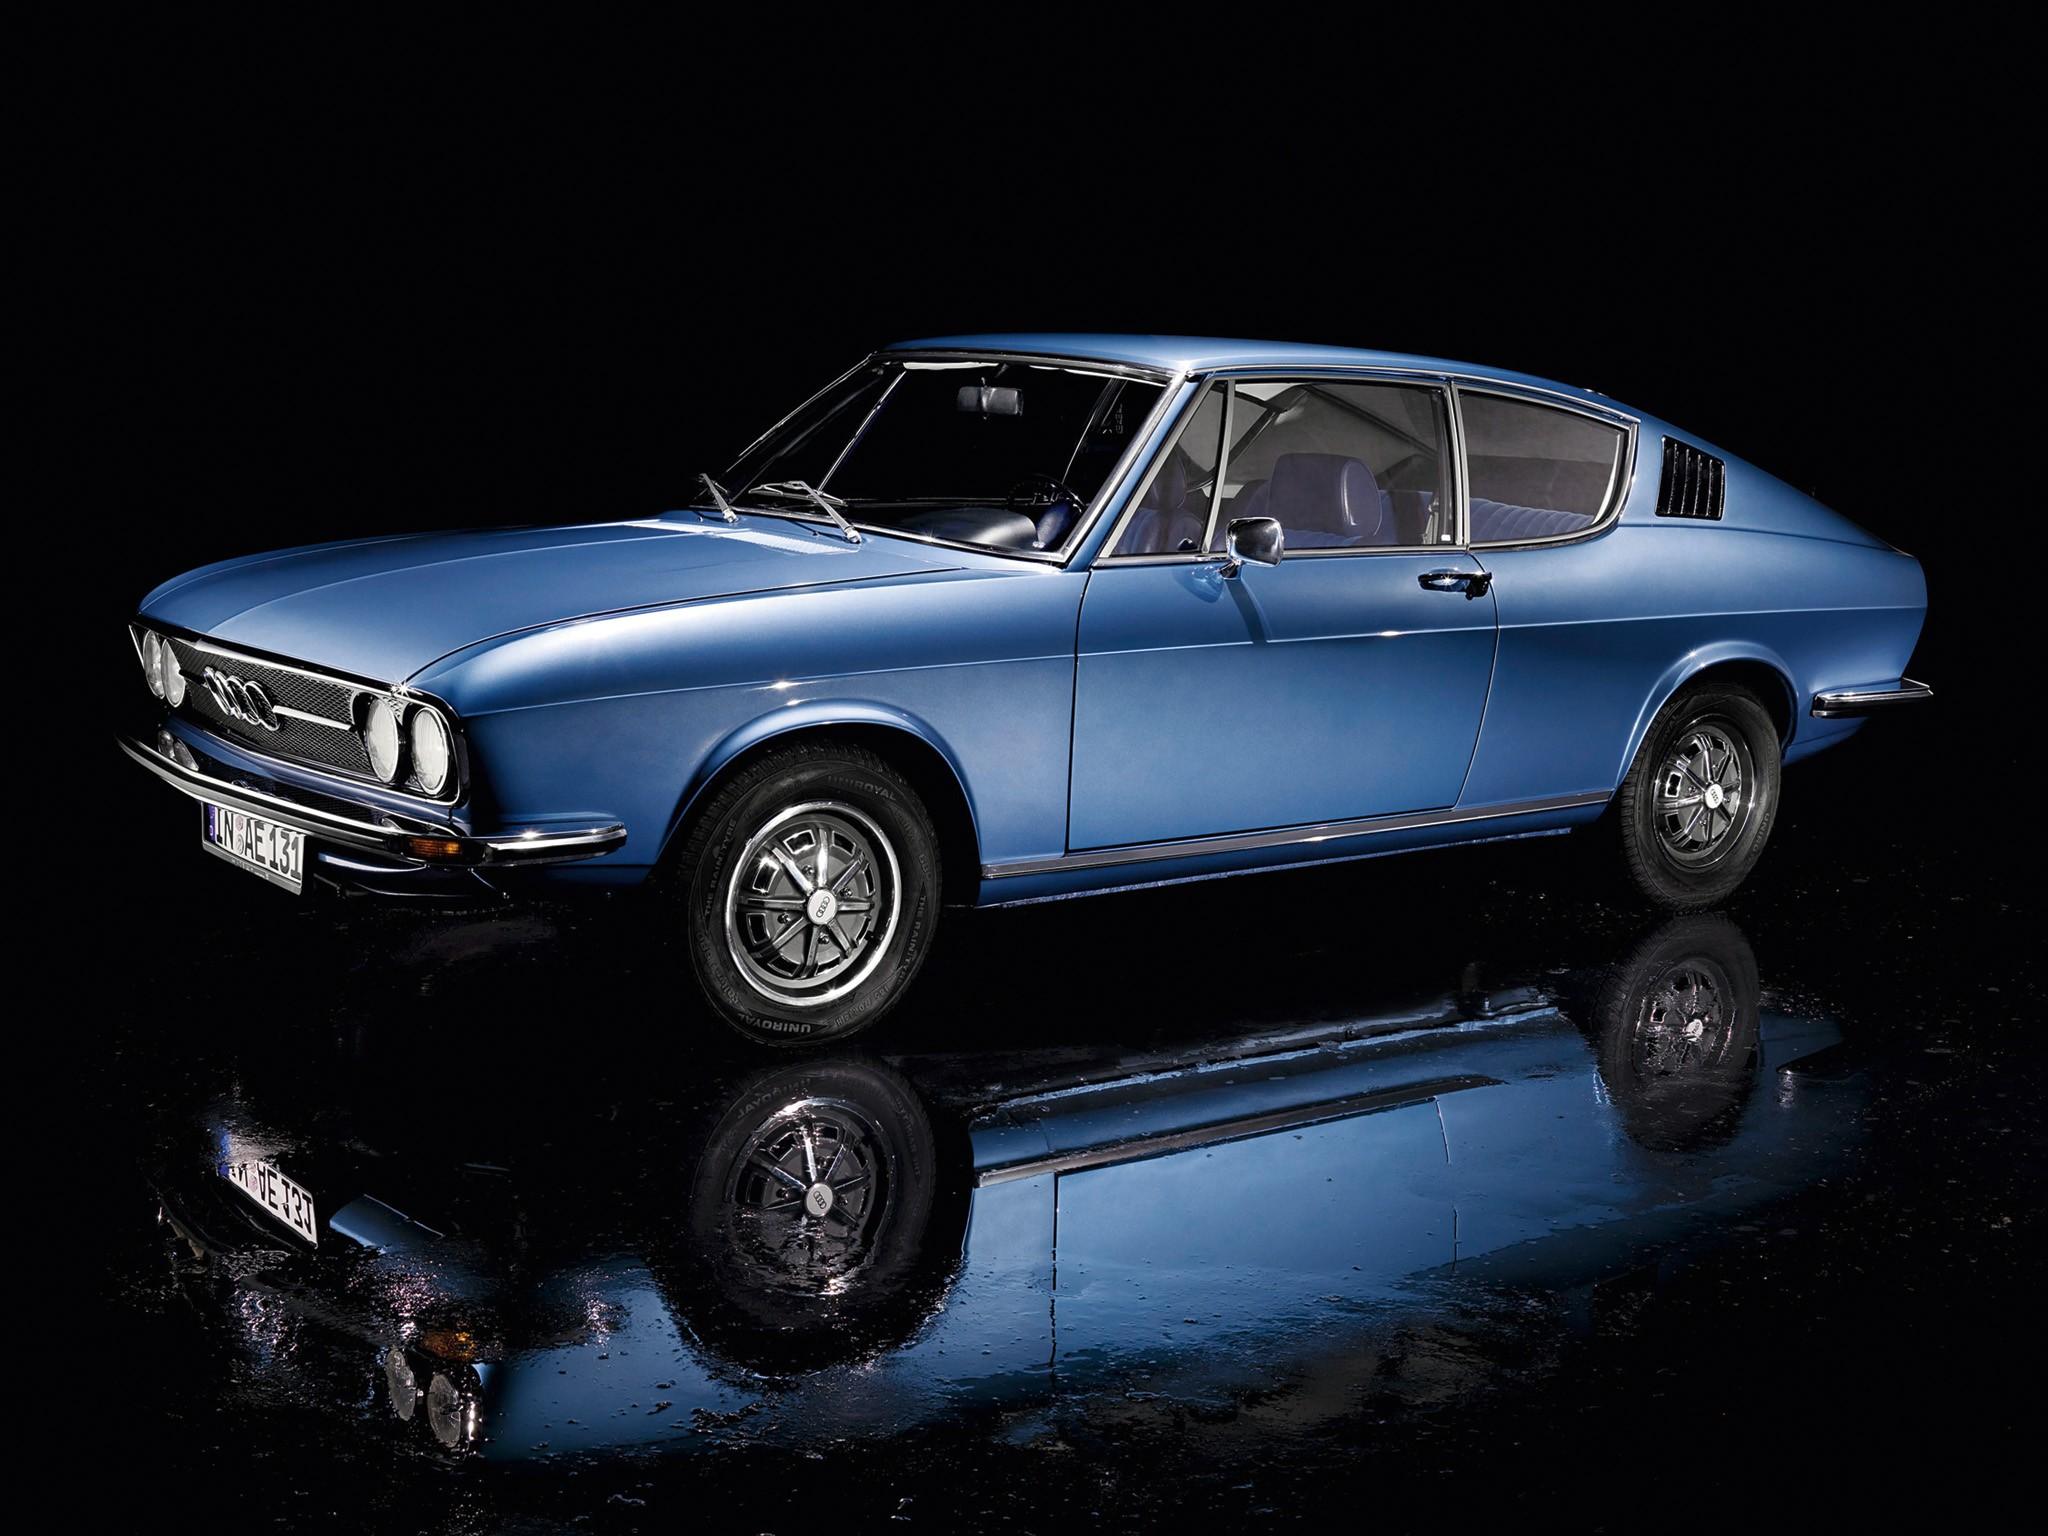 audi 100 coupe s specs 1970 1971 1972 1973 1974 1975 1976 autoevolution. Black Bedroom Furniture Sets. Home Design Ideas